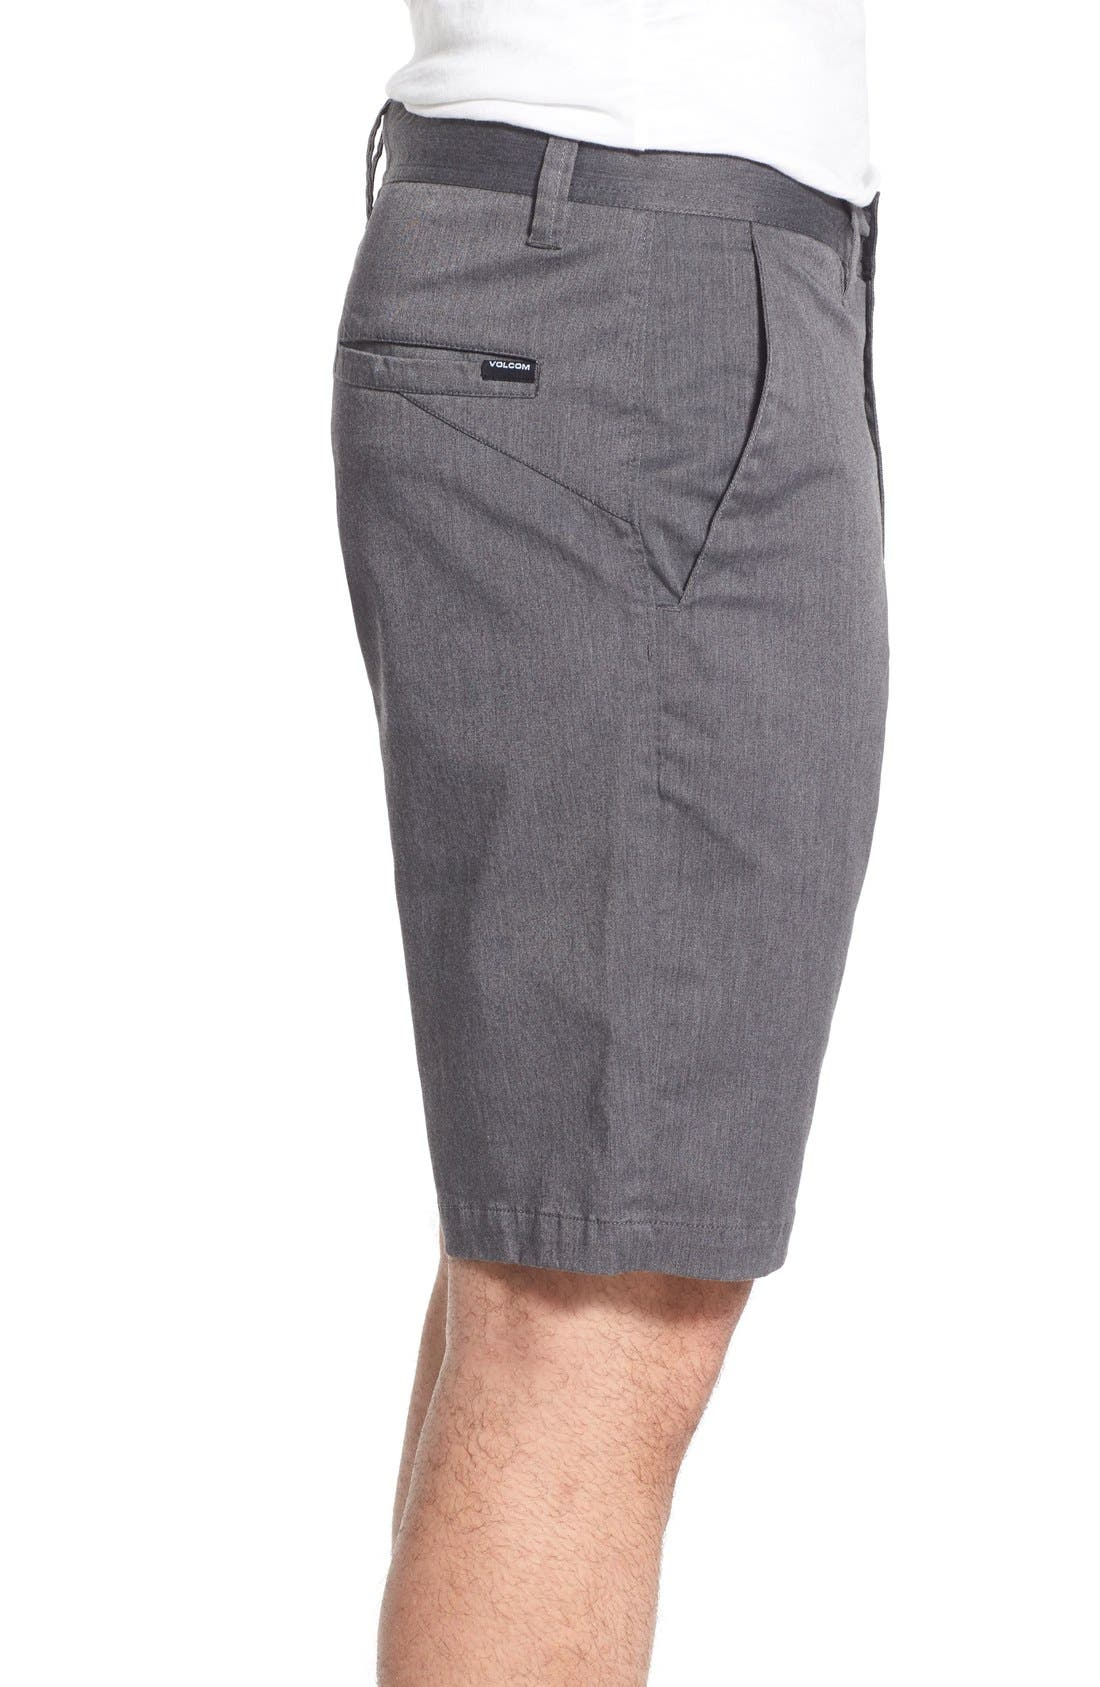 Alternate Image 3  - Volcom 'Lightweight' Shorts